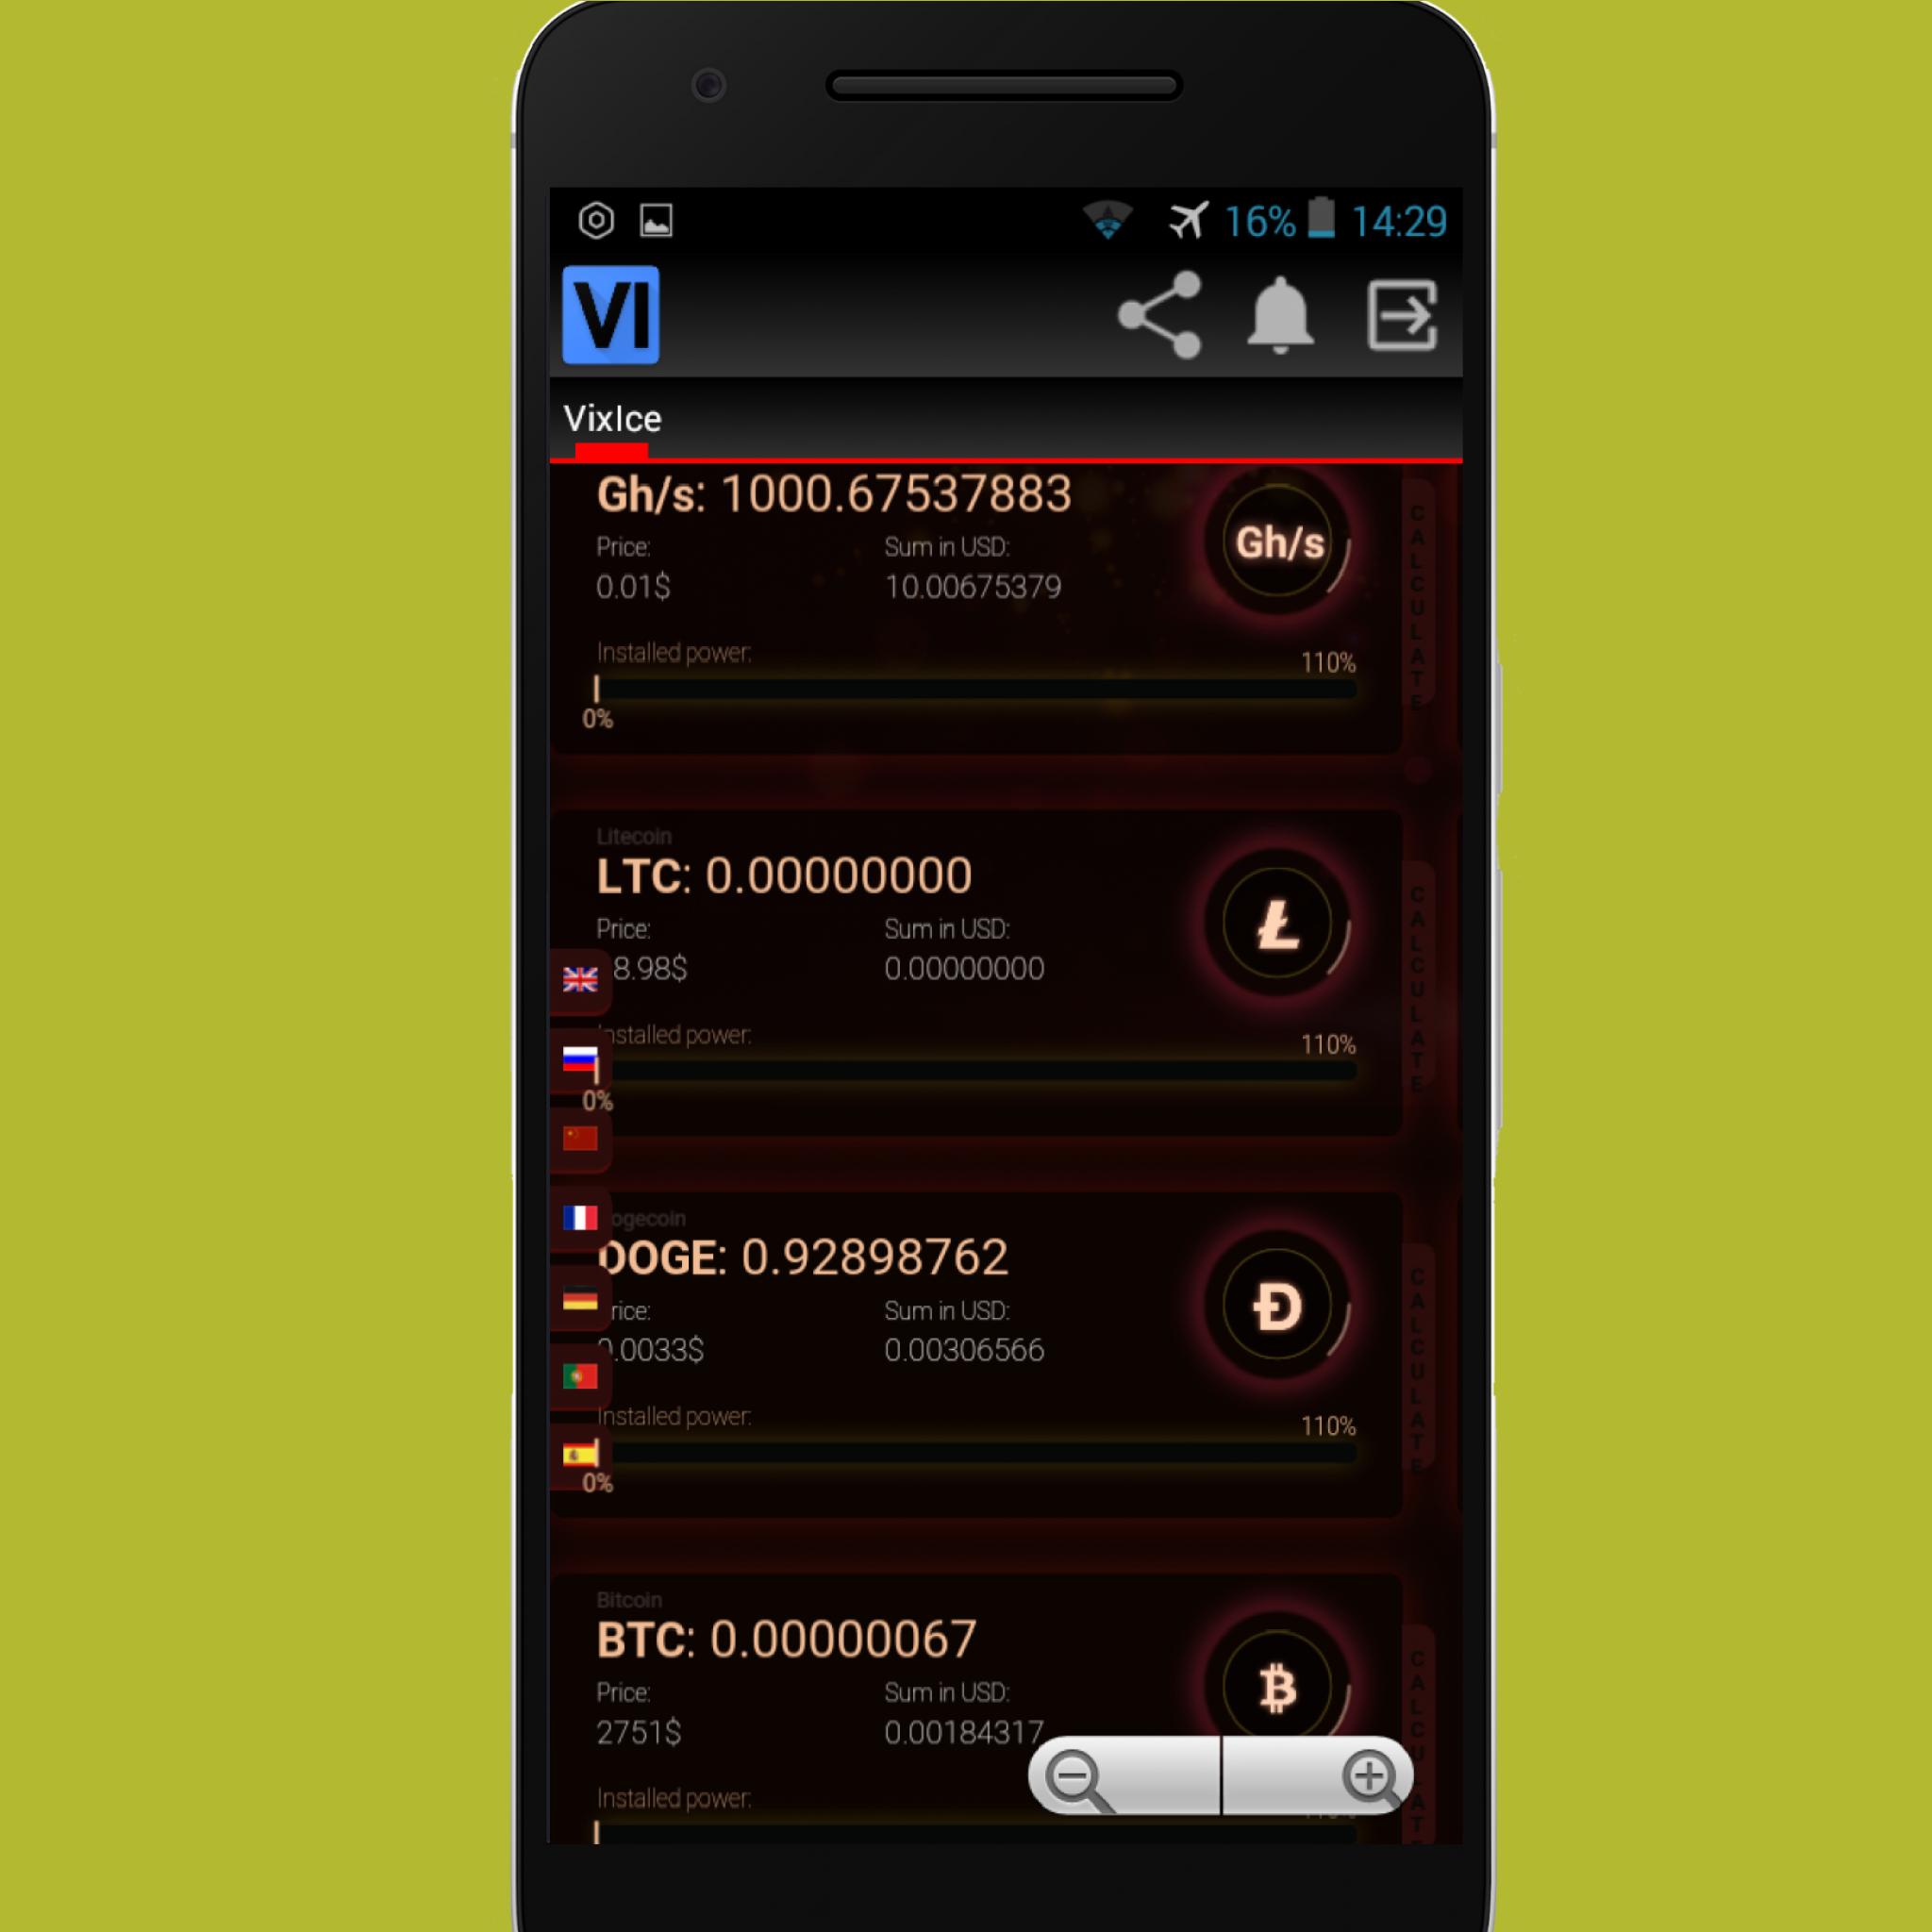 Vixice - Free Bitcoin Cloud Mining APKs   Android APK